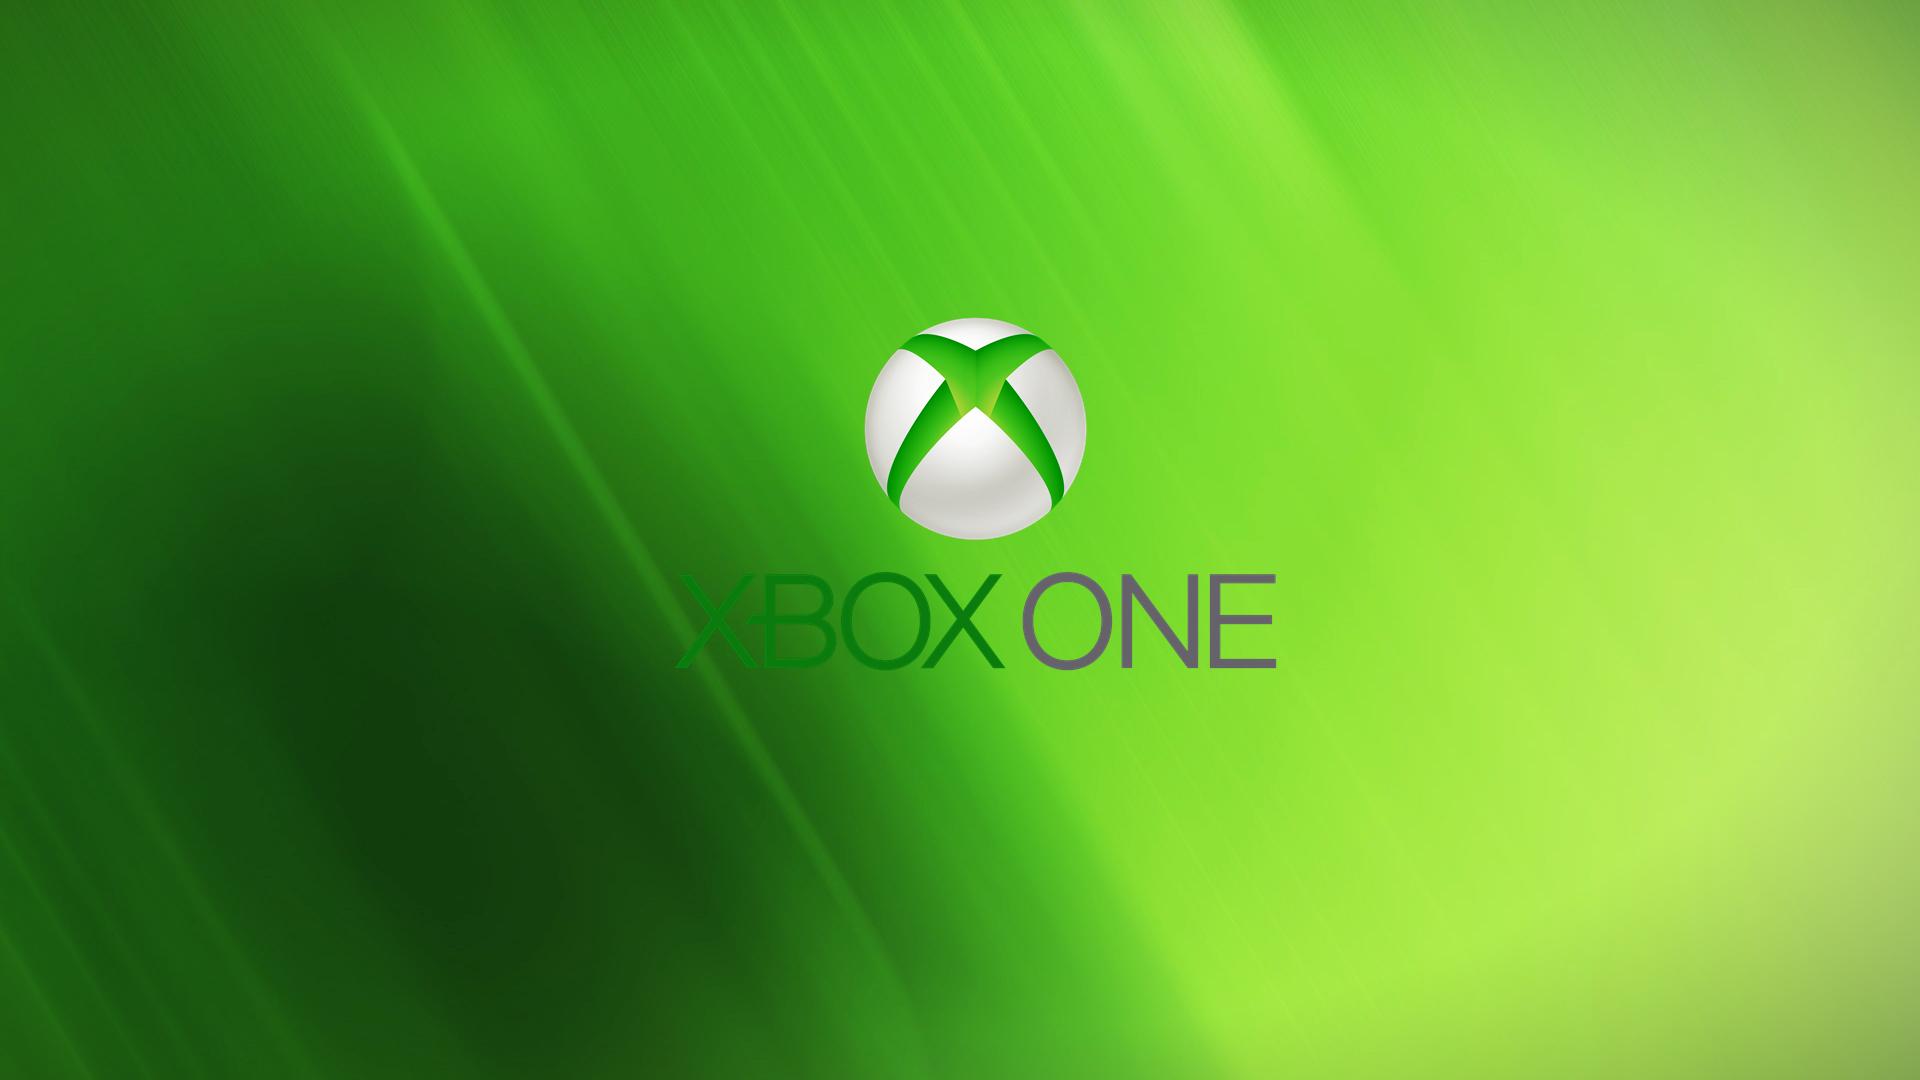 Anime Wallpapers For Xbox One Wallpapersafari